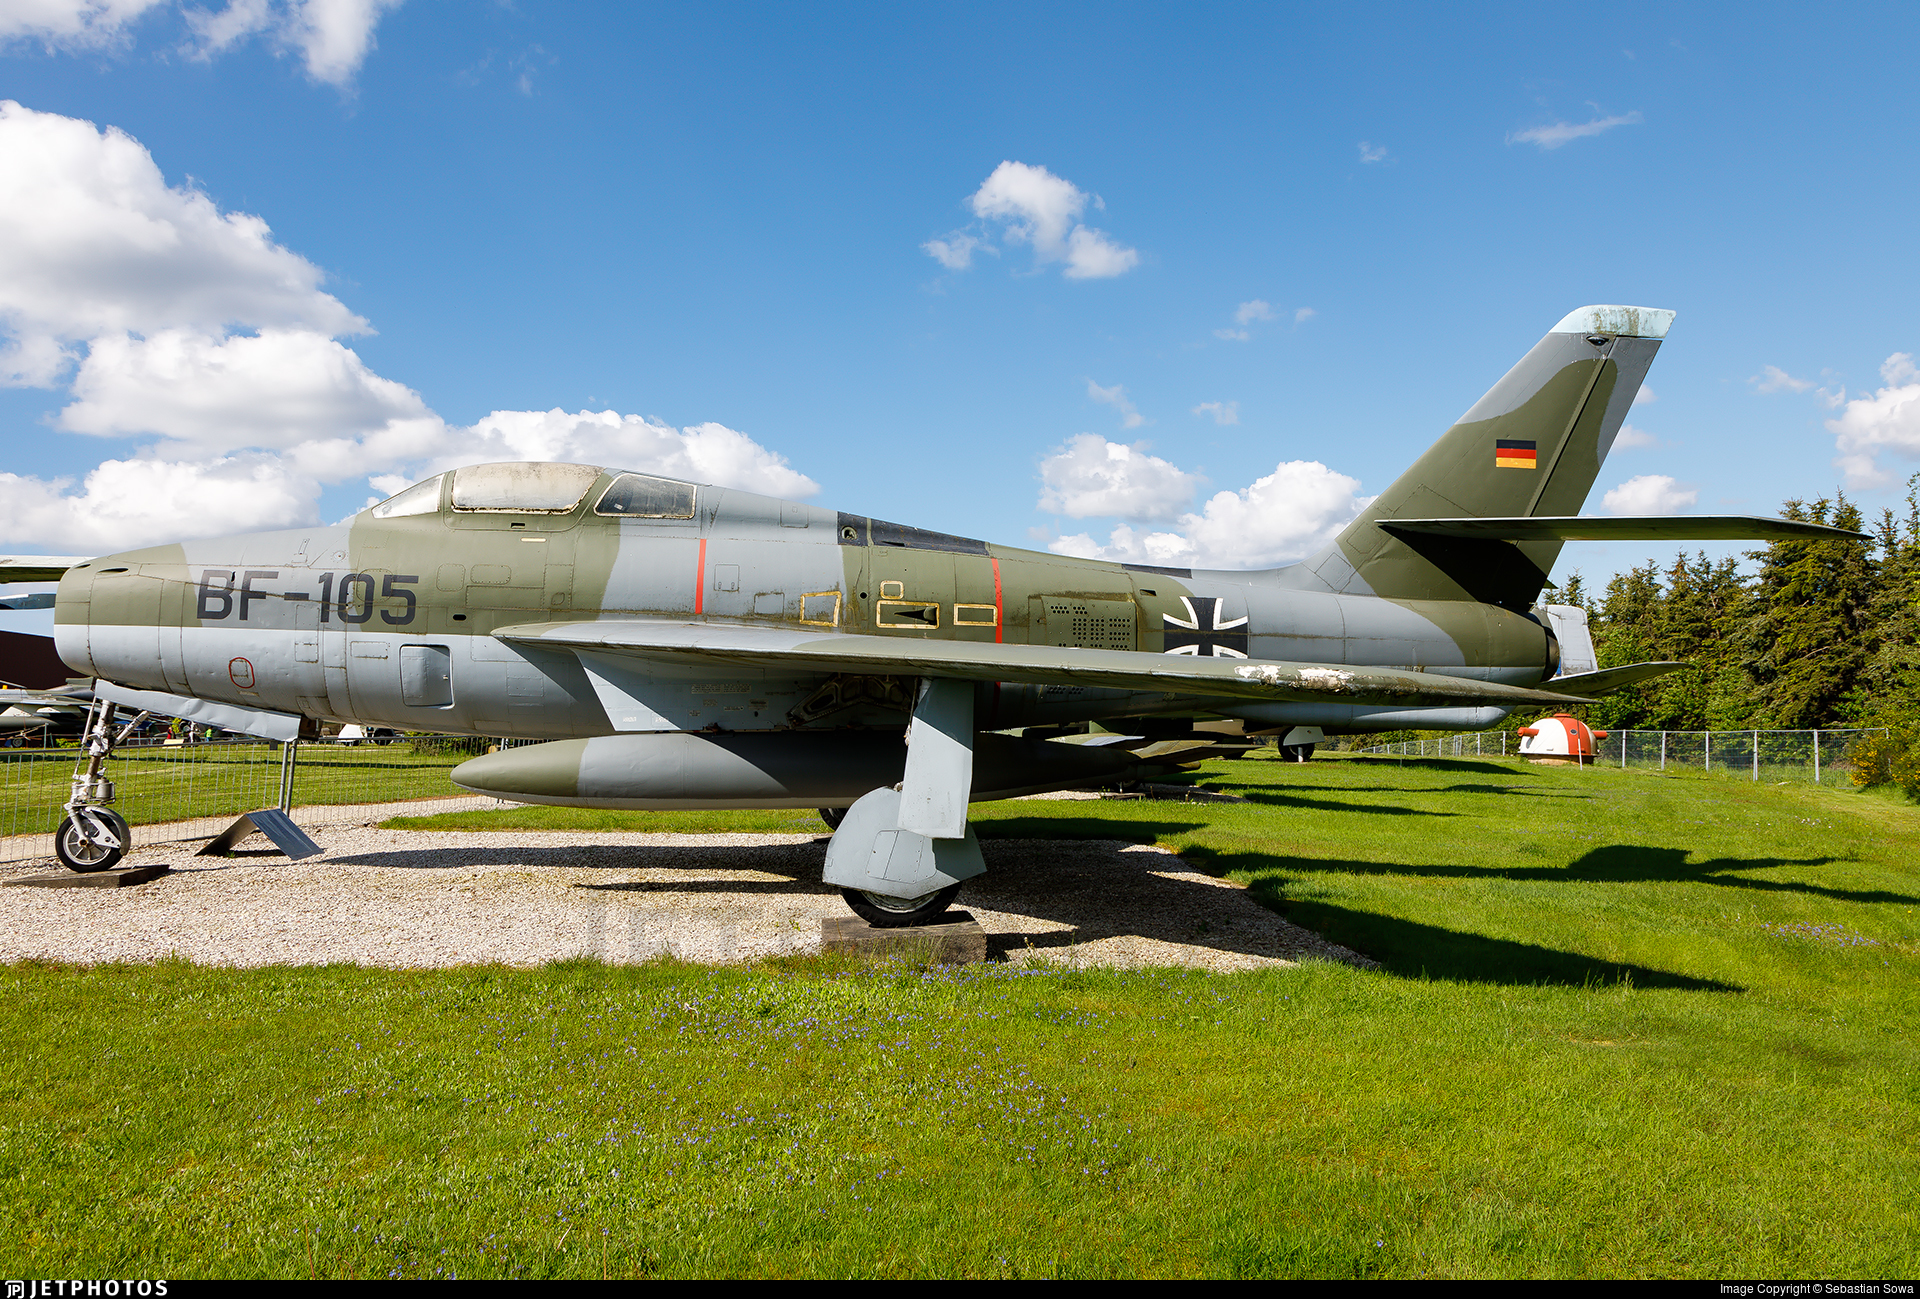 BF-105 - Republic F-84F Thunderstreak - Germany - Air Force